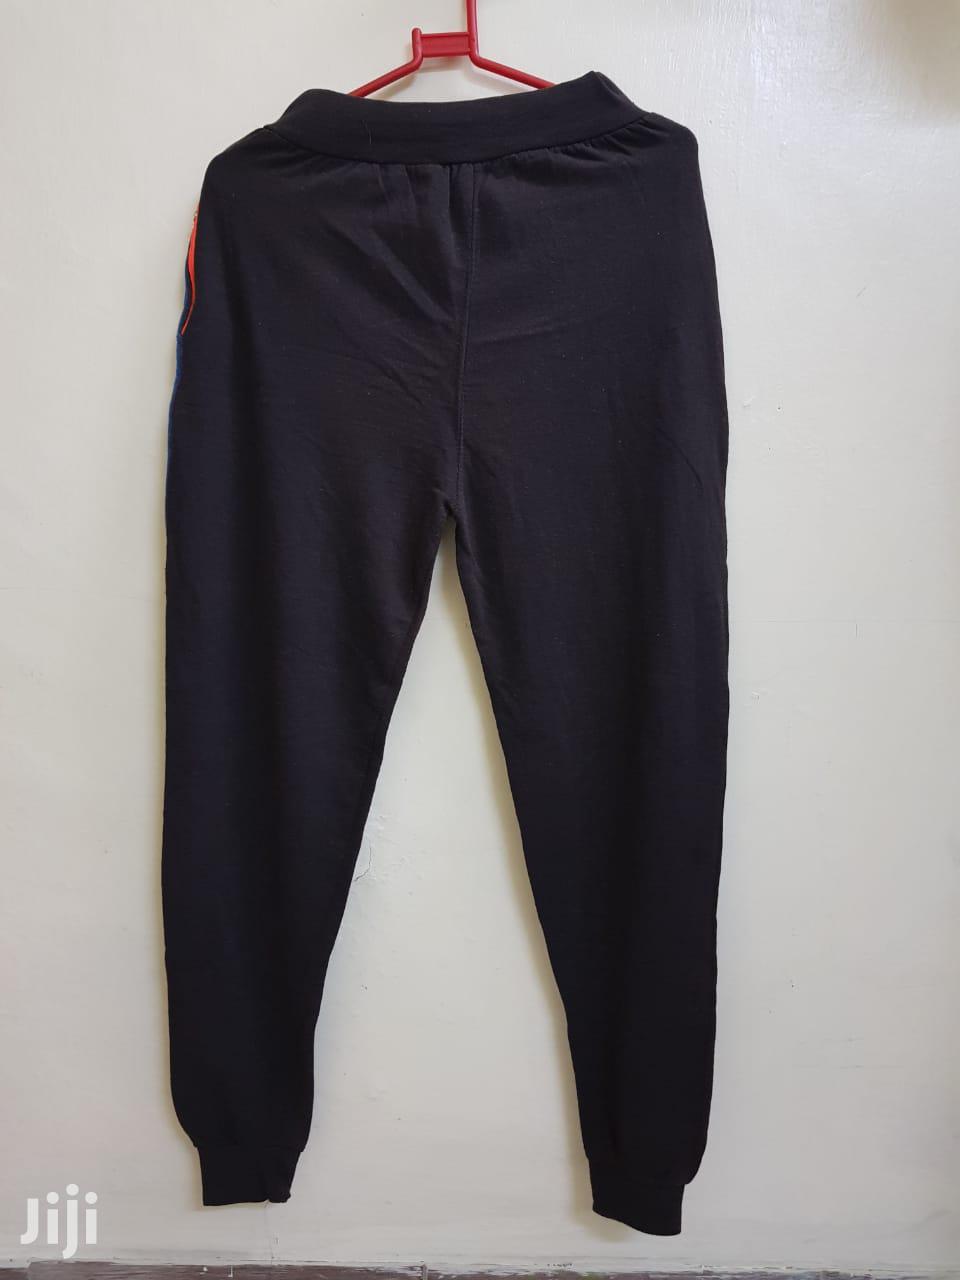 BRAND NEW..New Fashion Thin Section Sweatpant | Clothing for sale in Majengo, Mombasa, Kenya